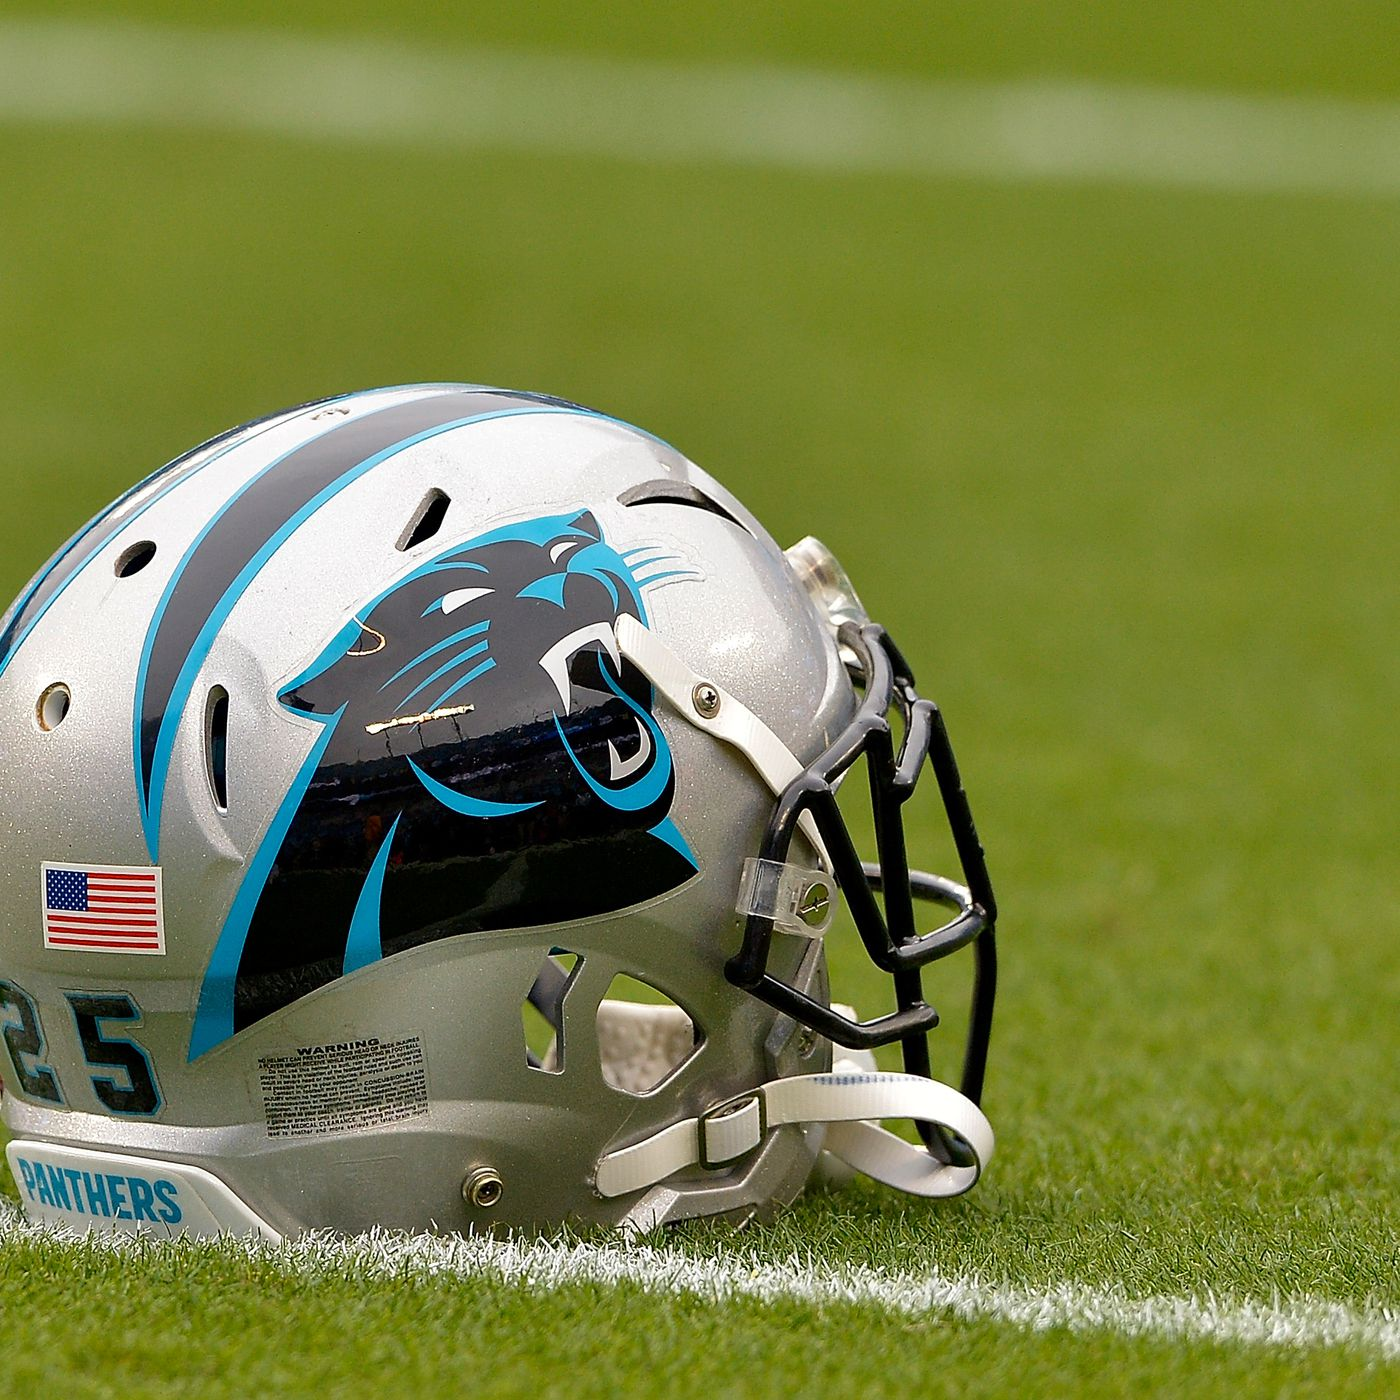 NFL preseason schedule 2018  Carolina Panthers preseason opponents revealed  - Cat Scratch Reader a080a7c08